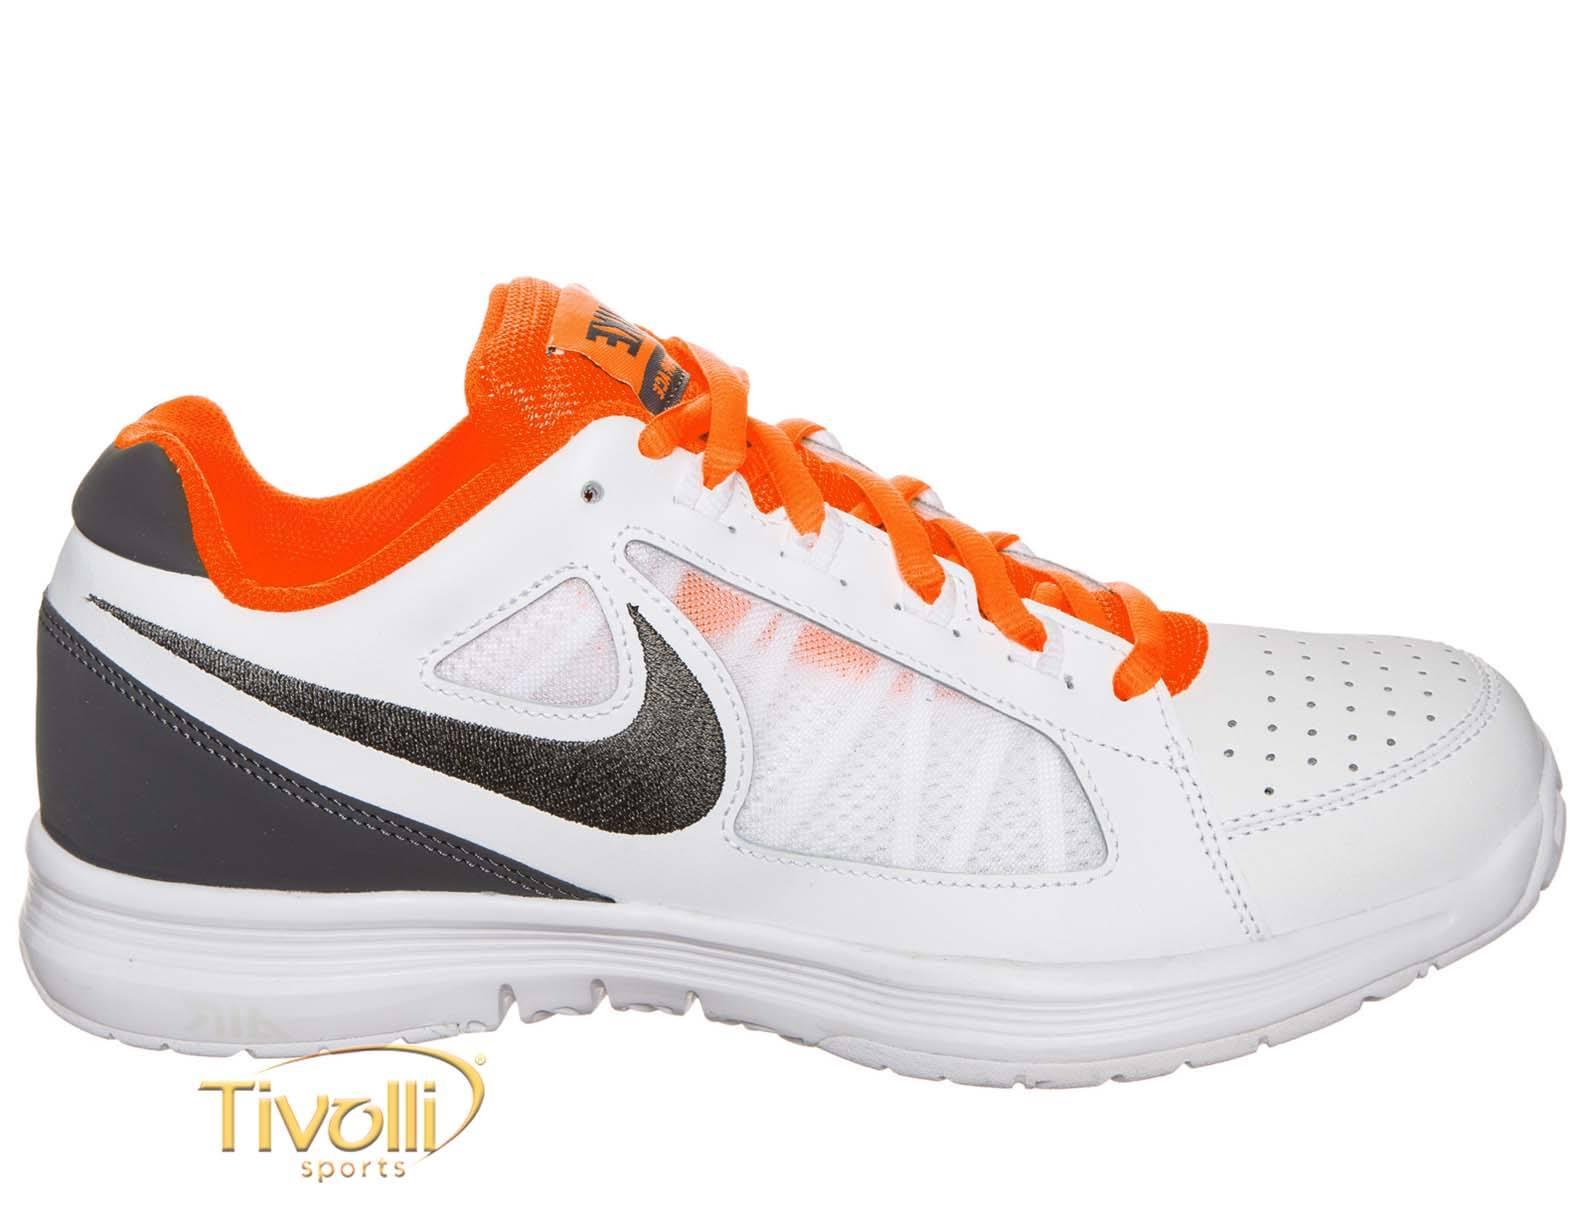 dc59f3fe1b Raquete Mania   Tênis Nike   Air Vapor Ace Branco